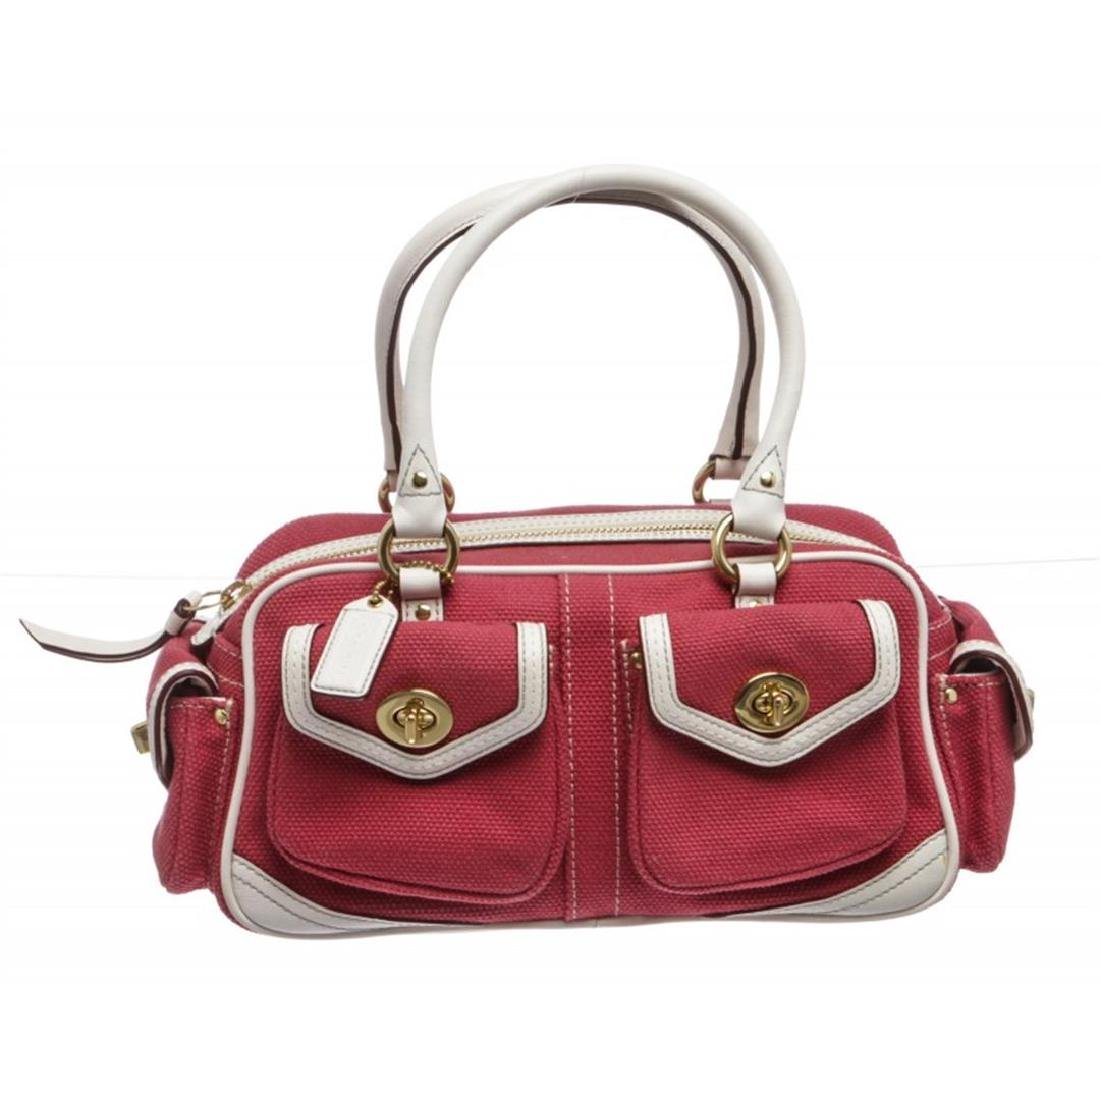 Coach Pink Canvas White Leather Trim Satchel handbag